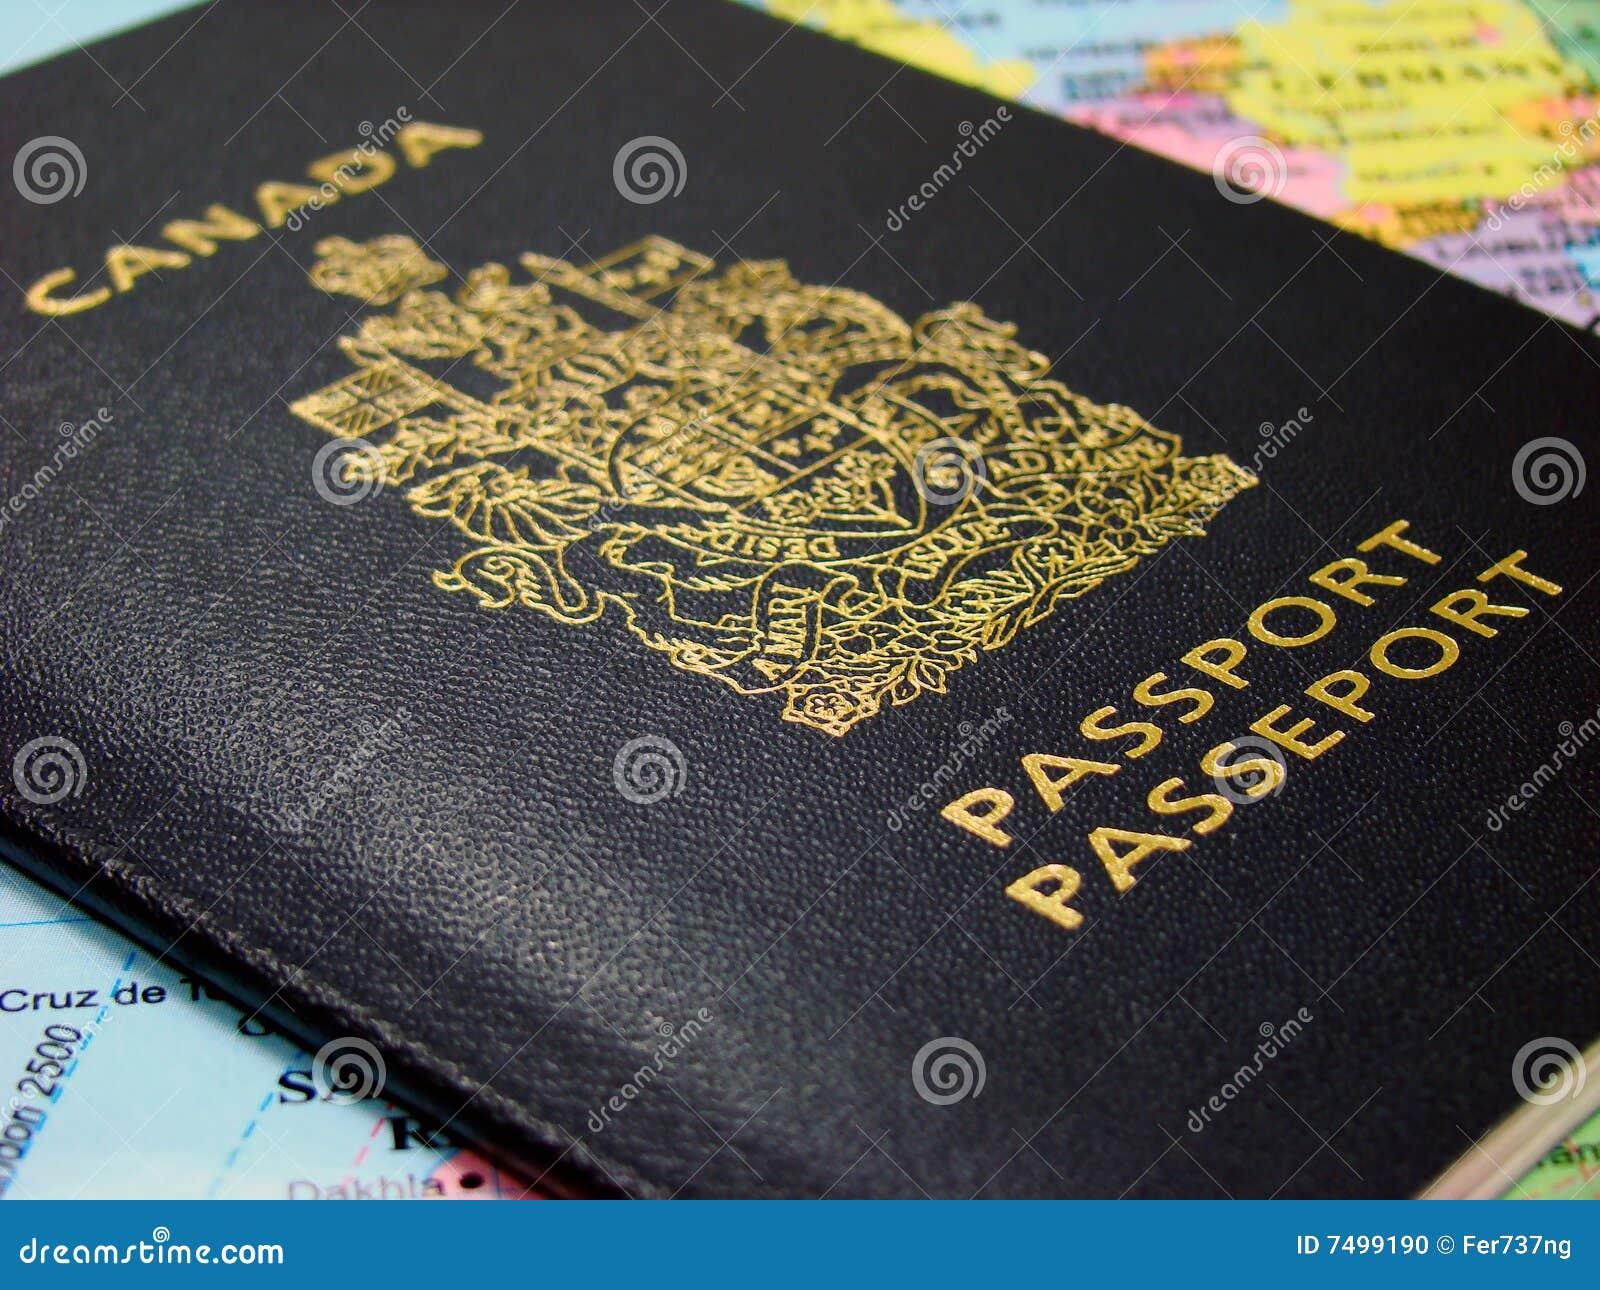 Pasaporte canadiense foto de archivo. Imagen de francés - 7499190